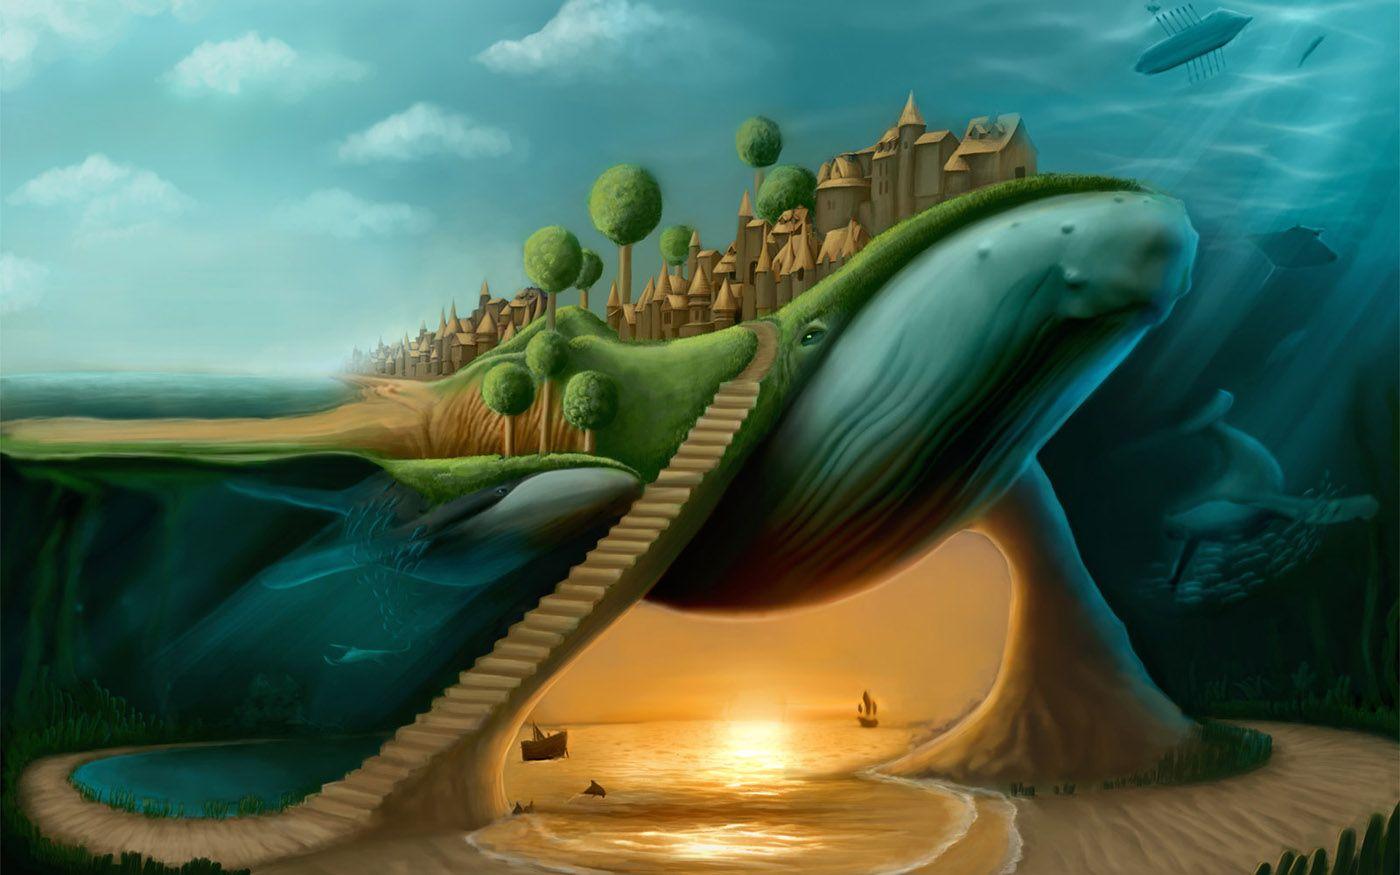 Humpback_whales Picture (2d, surrealism, fantasy | Wallpaperlo.com ...